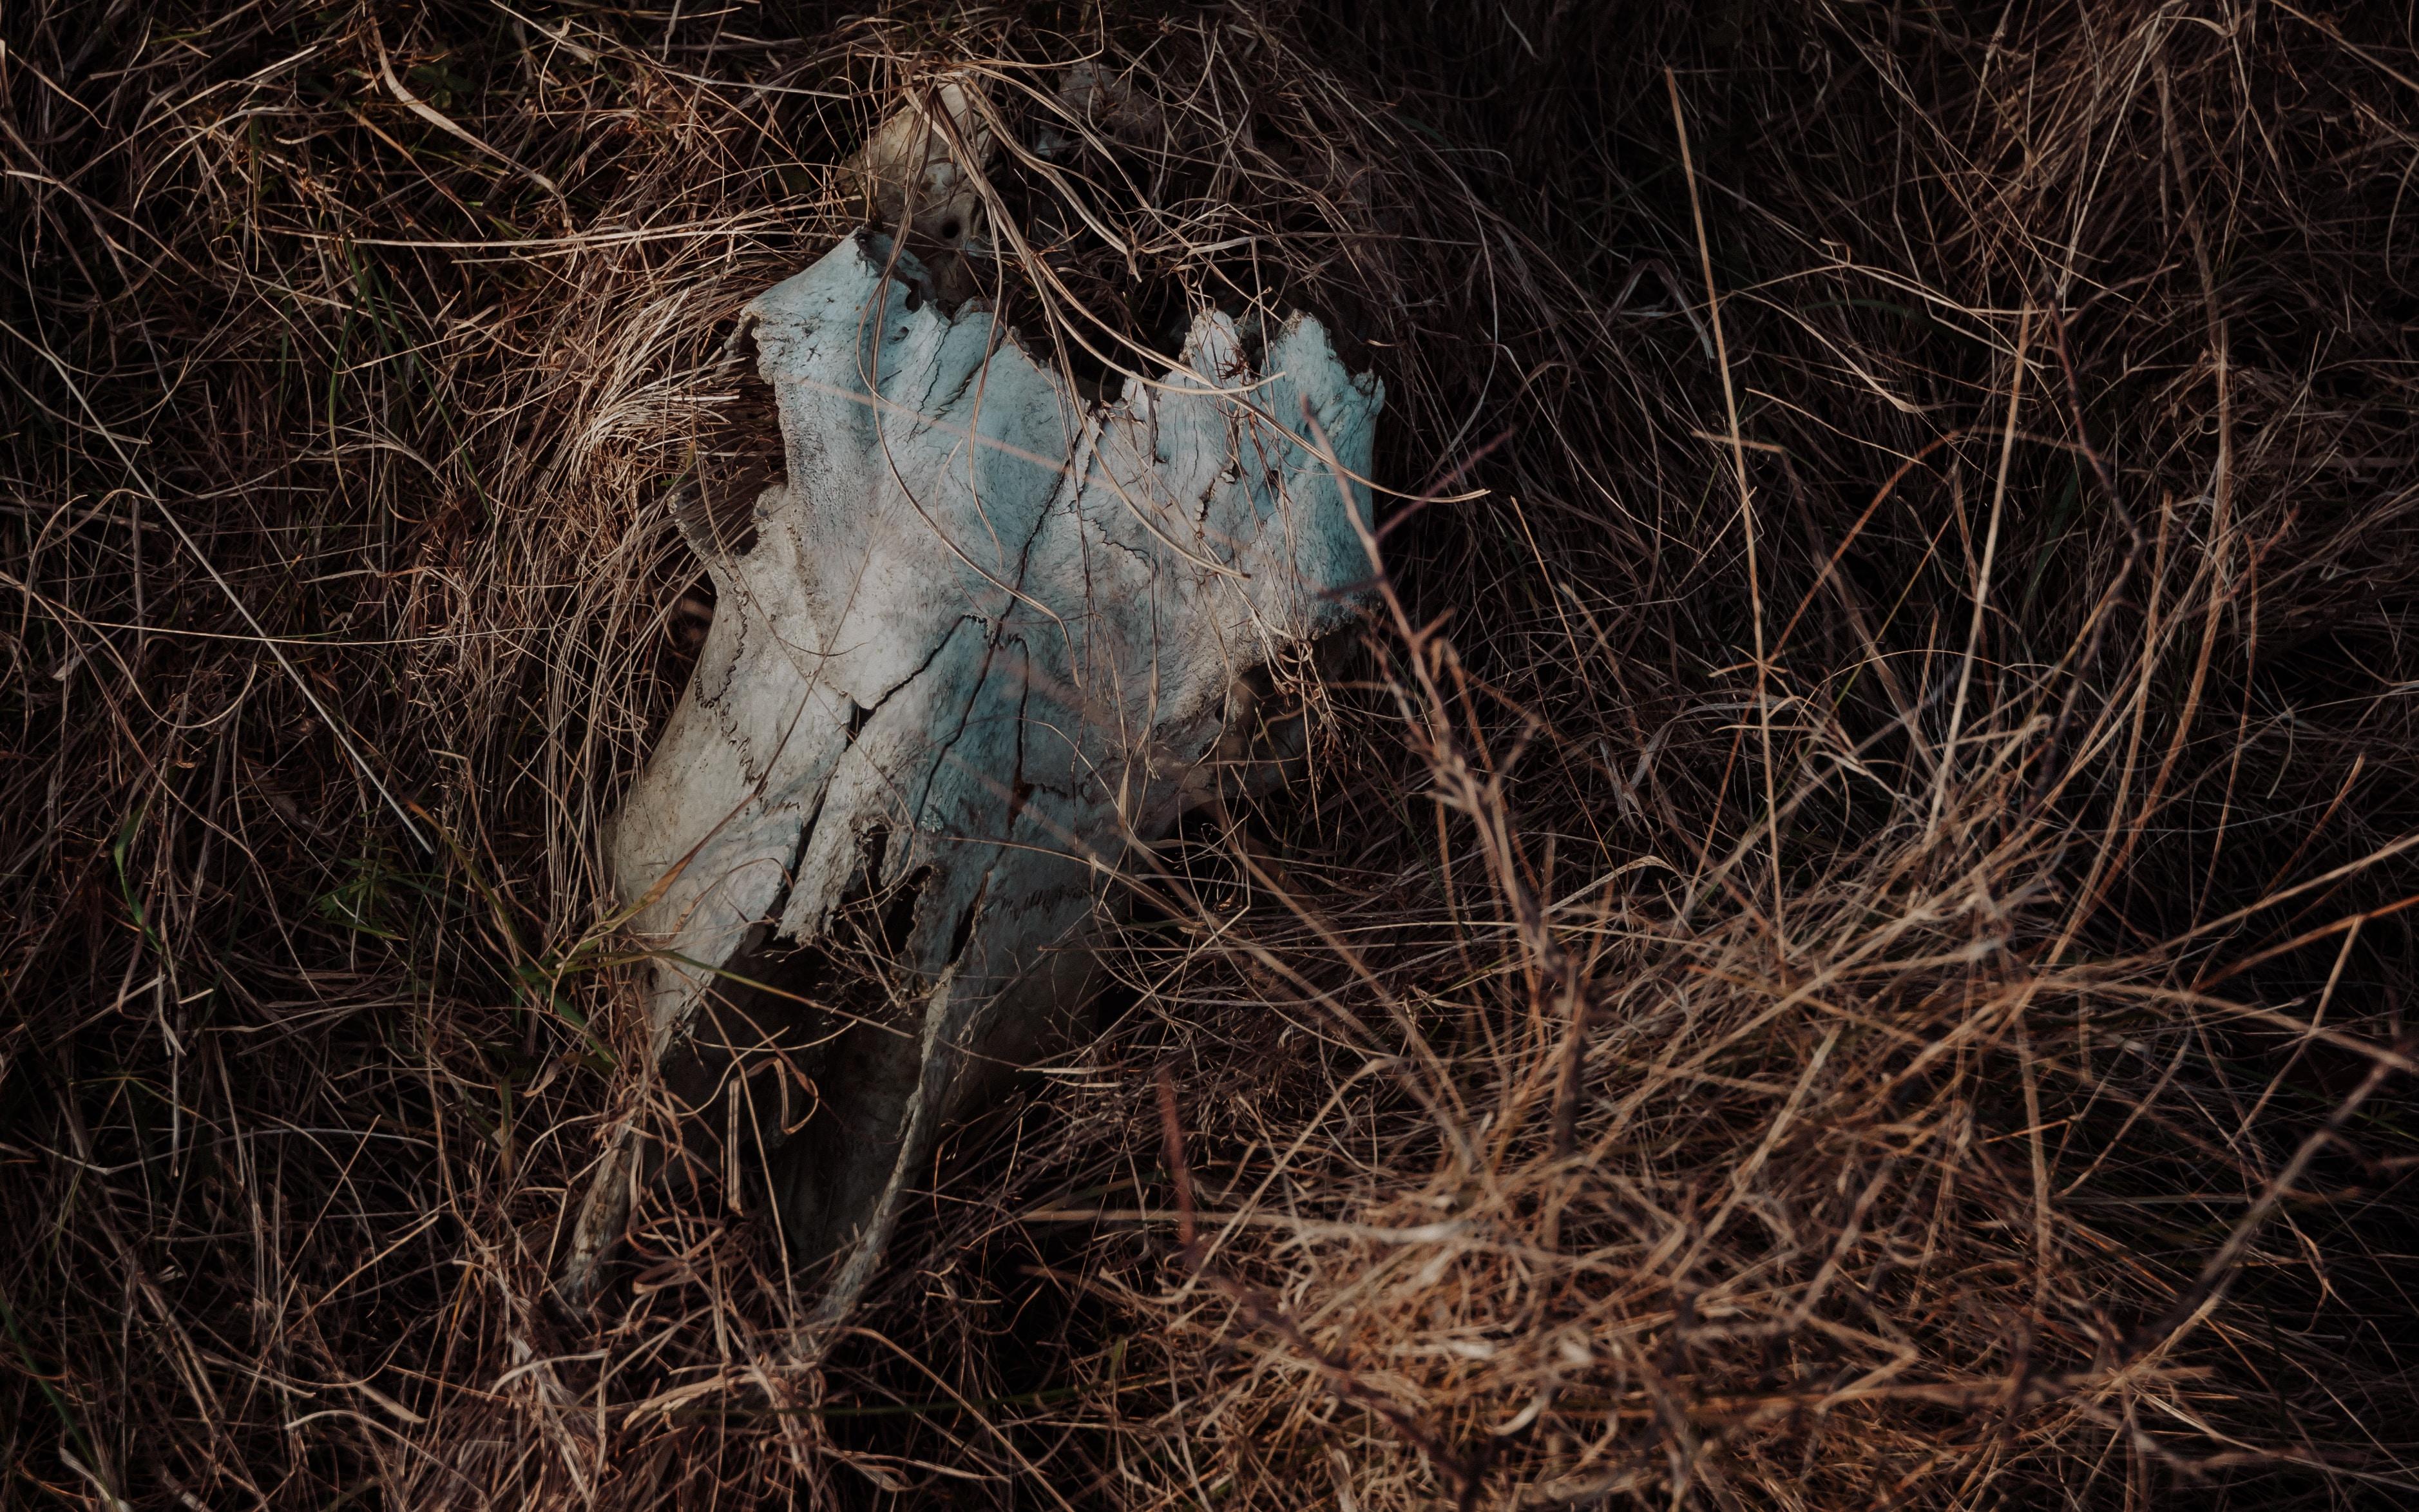 animal skull on hay